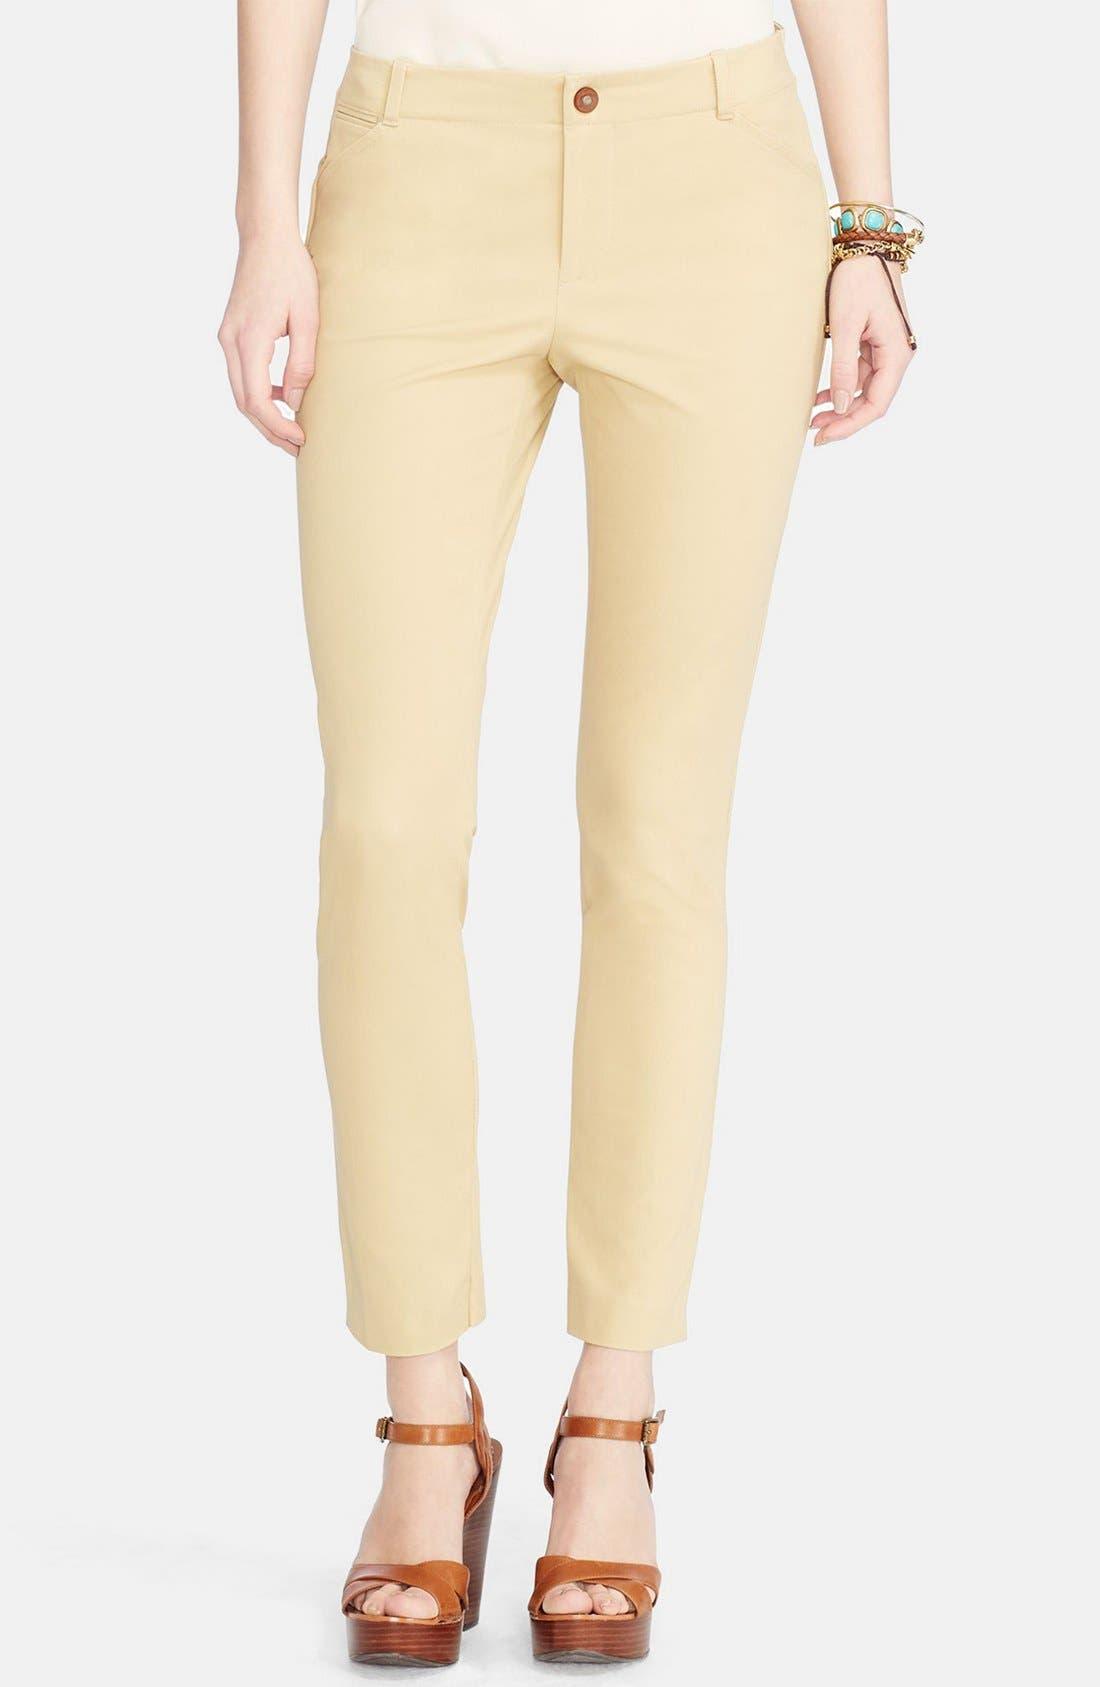 Alternate Image 1 Selected - Lauren Ralph Lauren Stretch Cotton Skinny Pants (Regular & Petite)